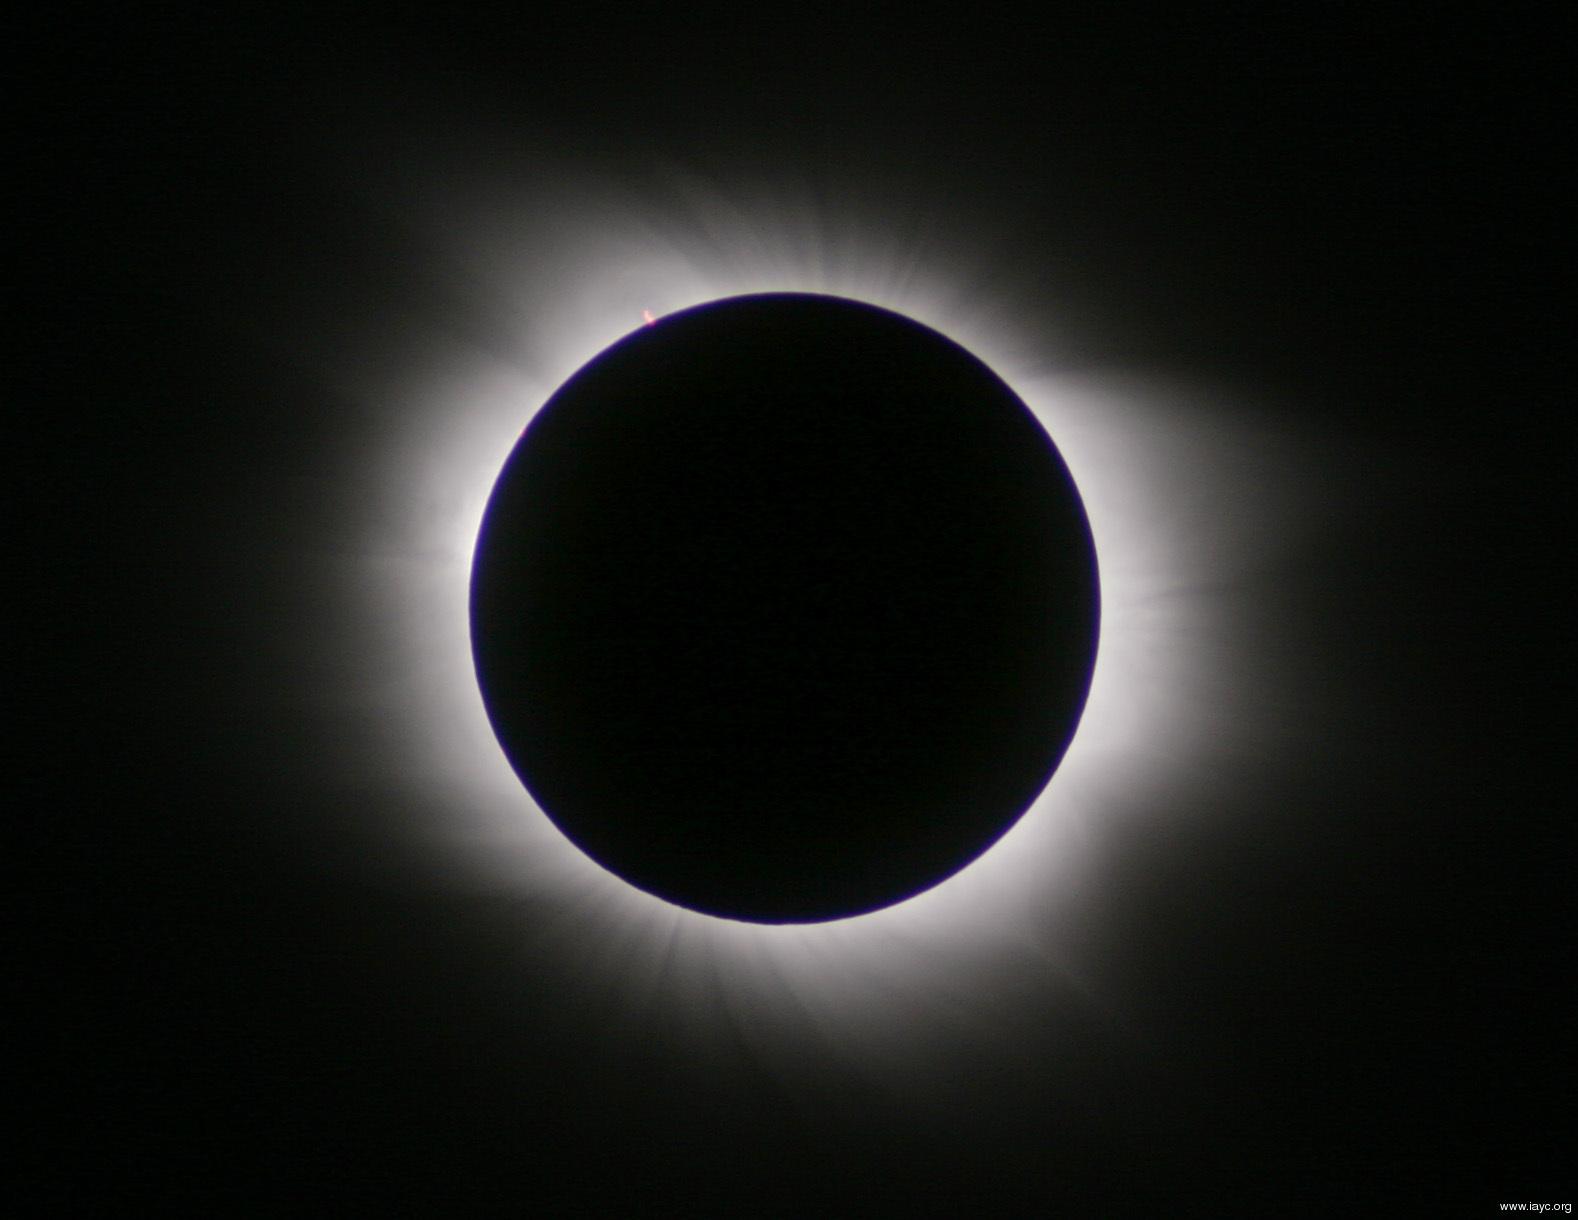 Celebrity Astrologer Neil D Paris: Cancer Solar Eclipse (Jul 1)